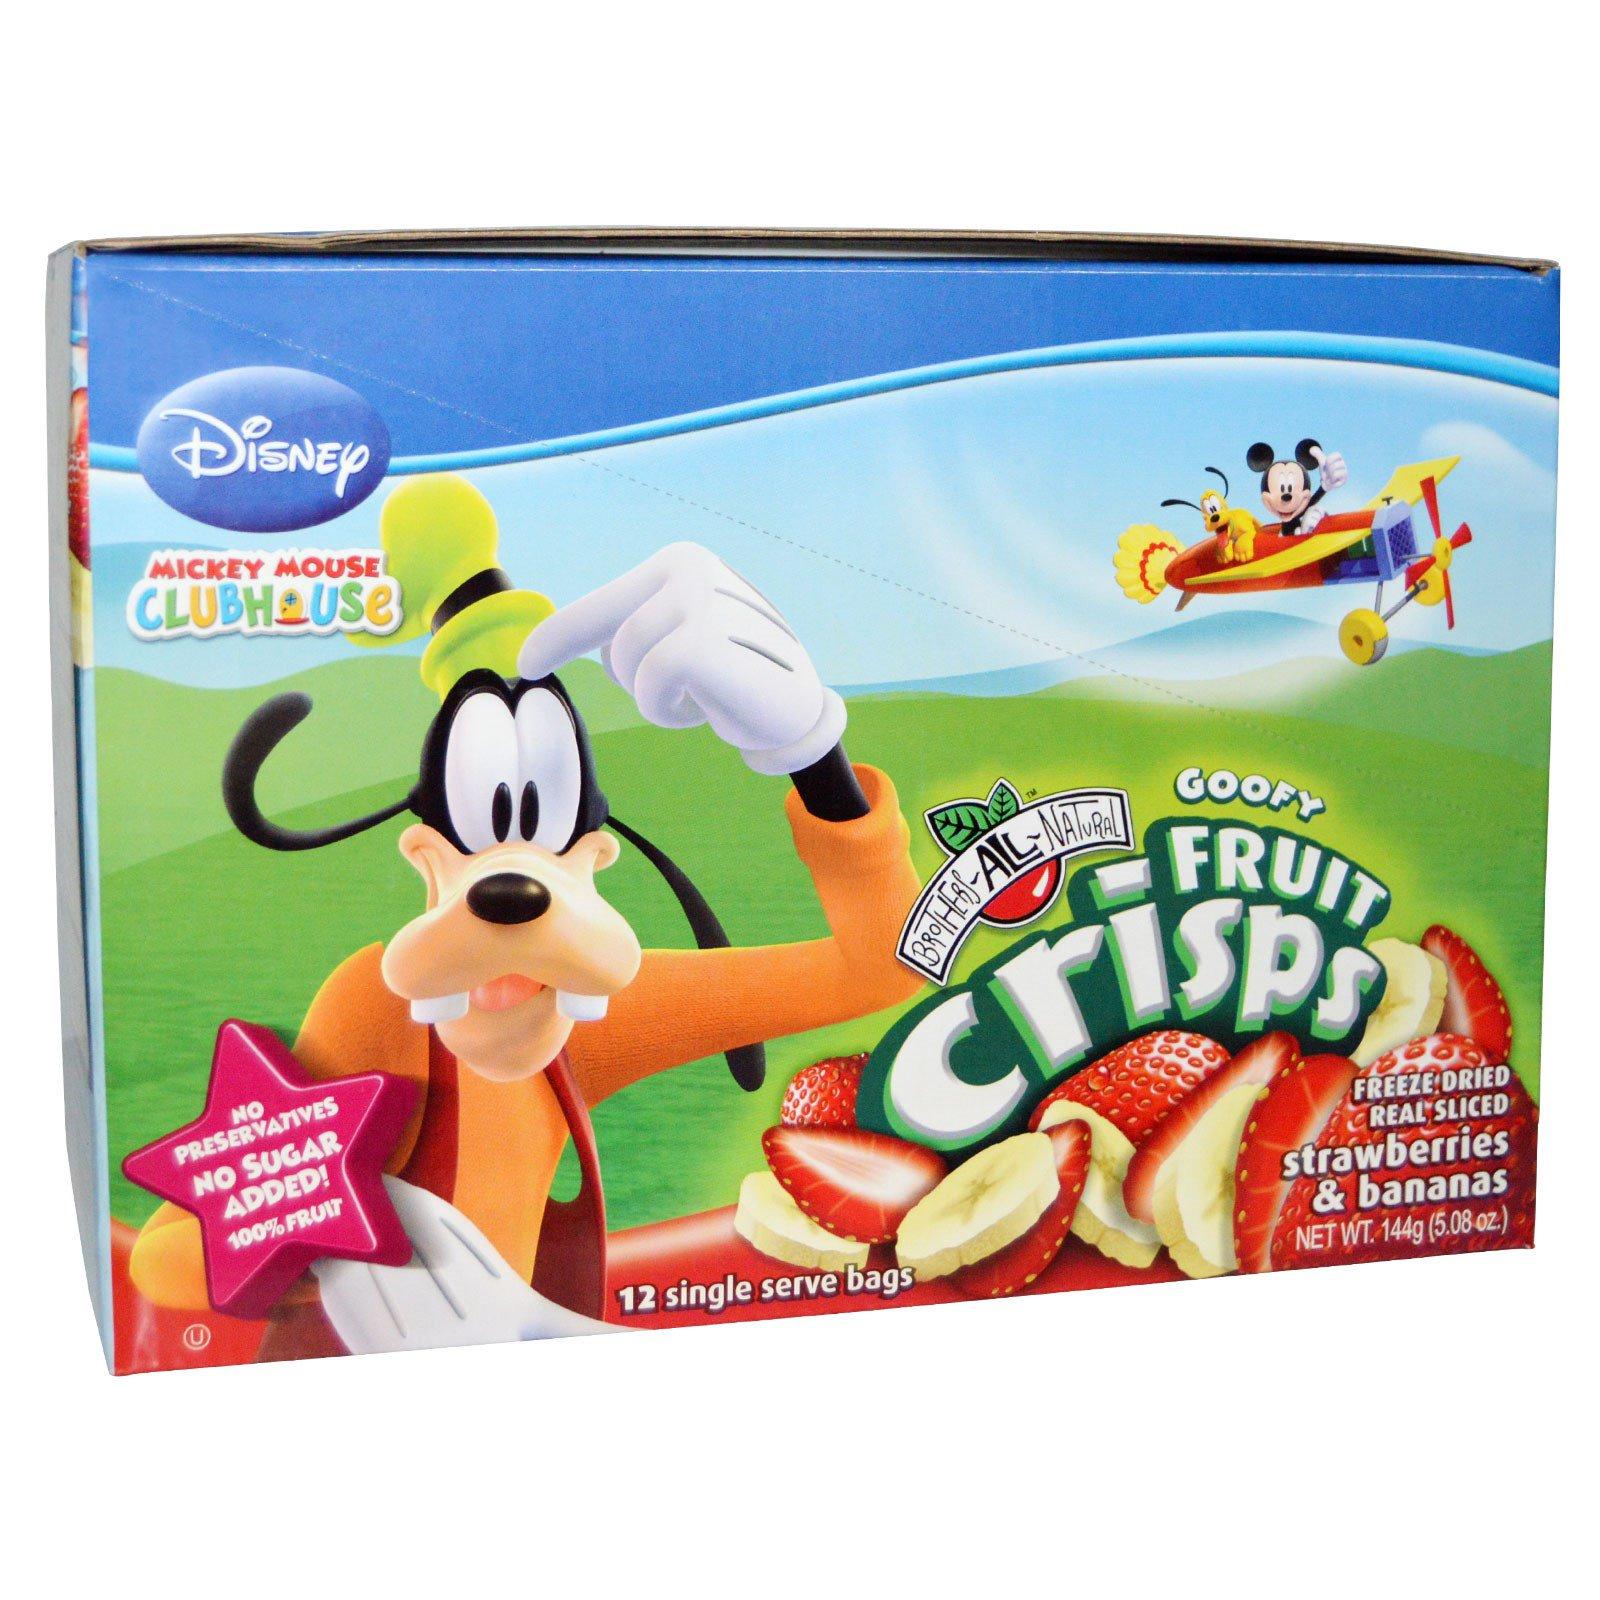 Brothers-All-Natural, Disney Goofy Fruit Crisps, Strawberries & Bananas, 12 Single Serve Bags, 5.08 oz (144 g)